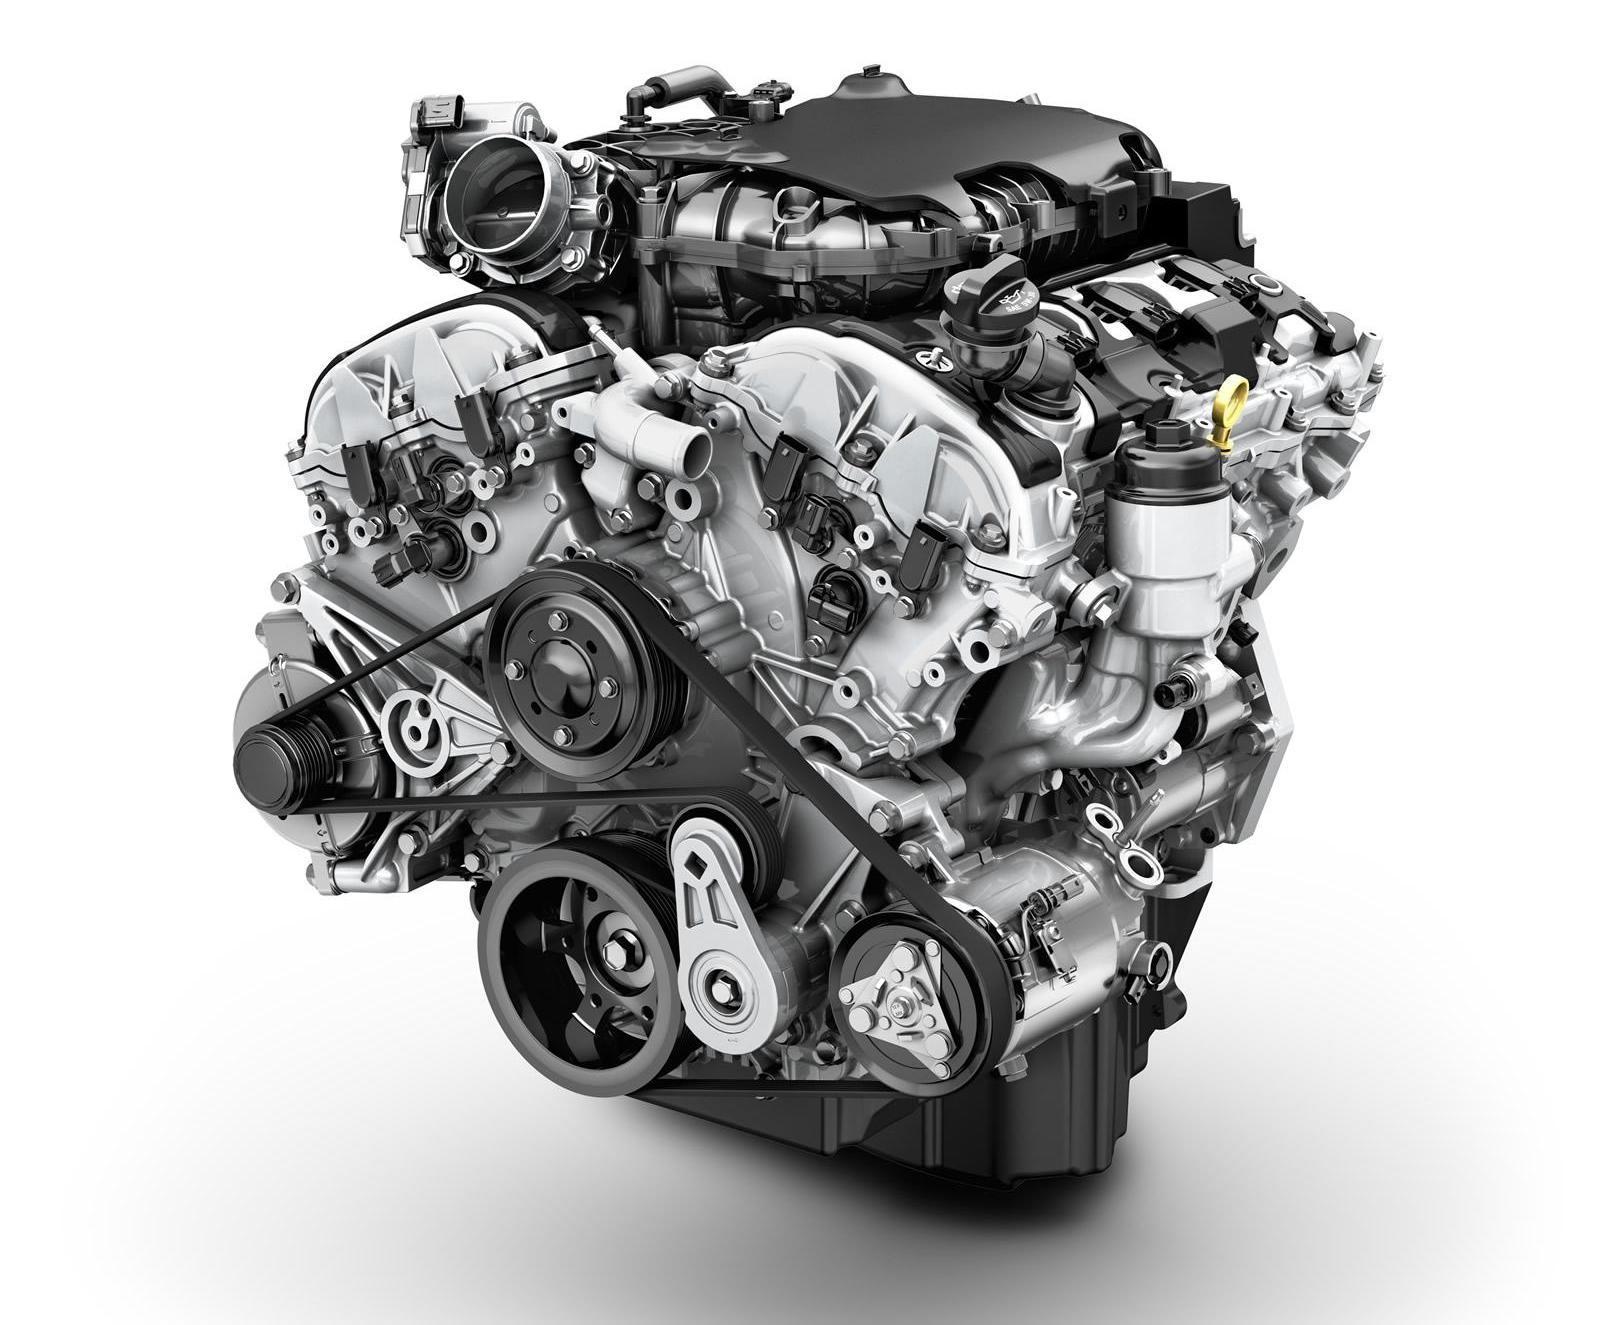 2015 Chevrolet Colorado Engine